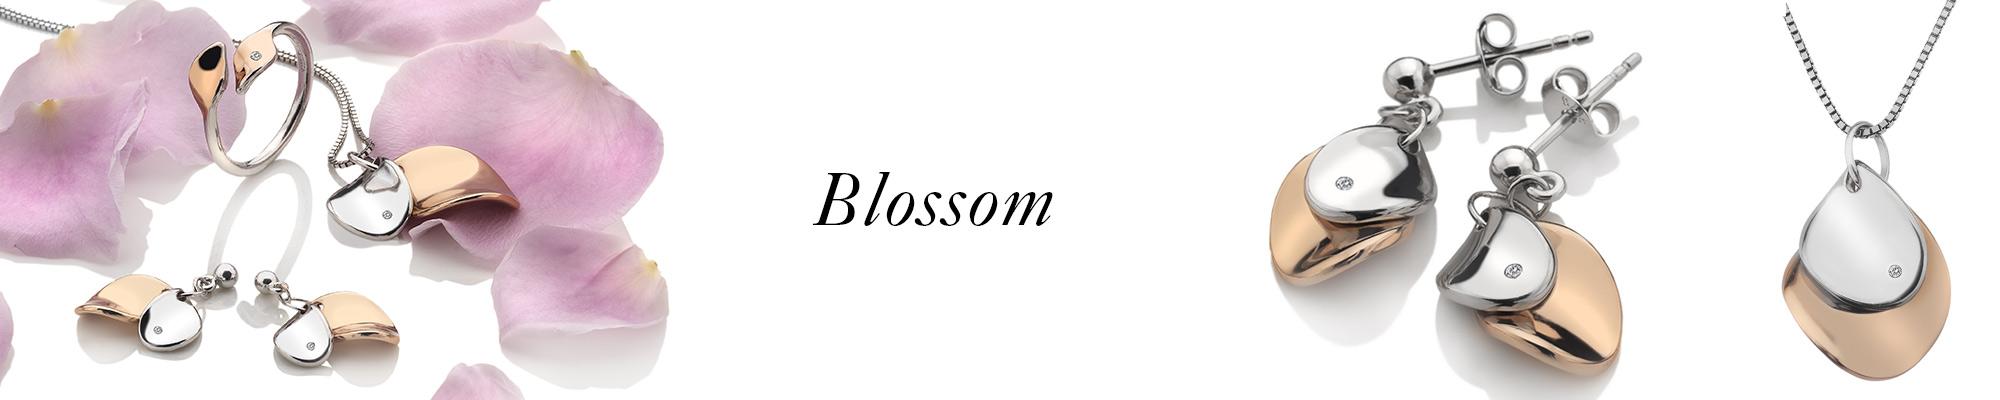 kolekce Blossom